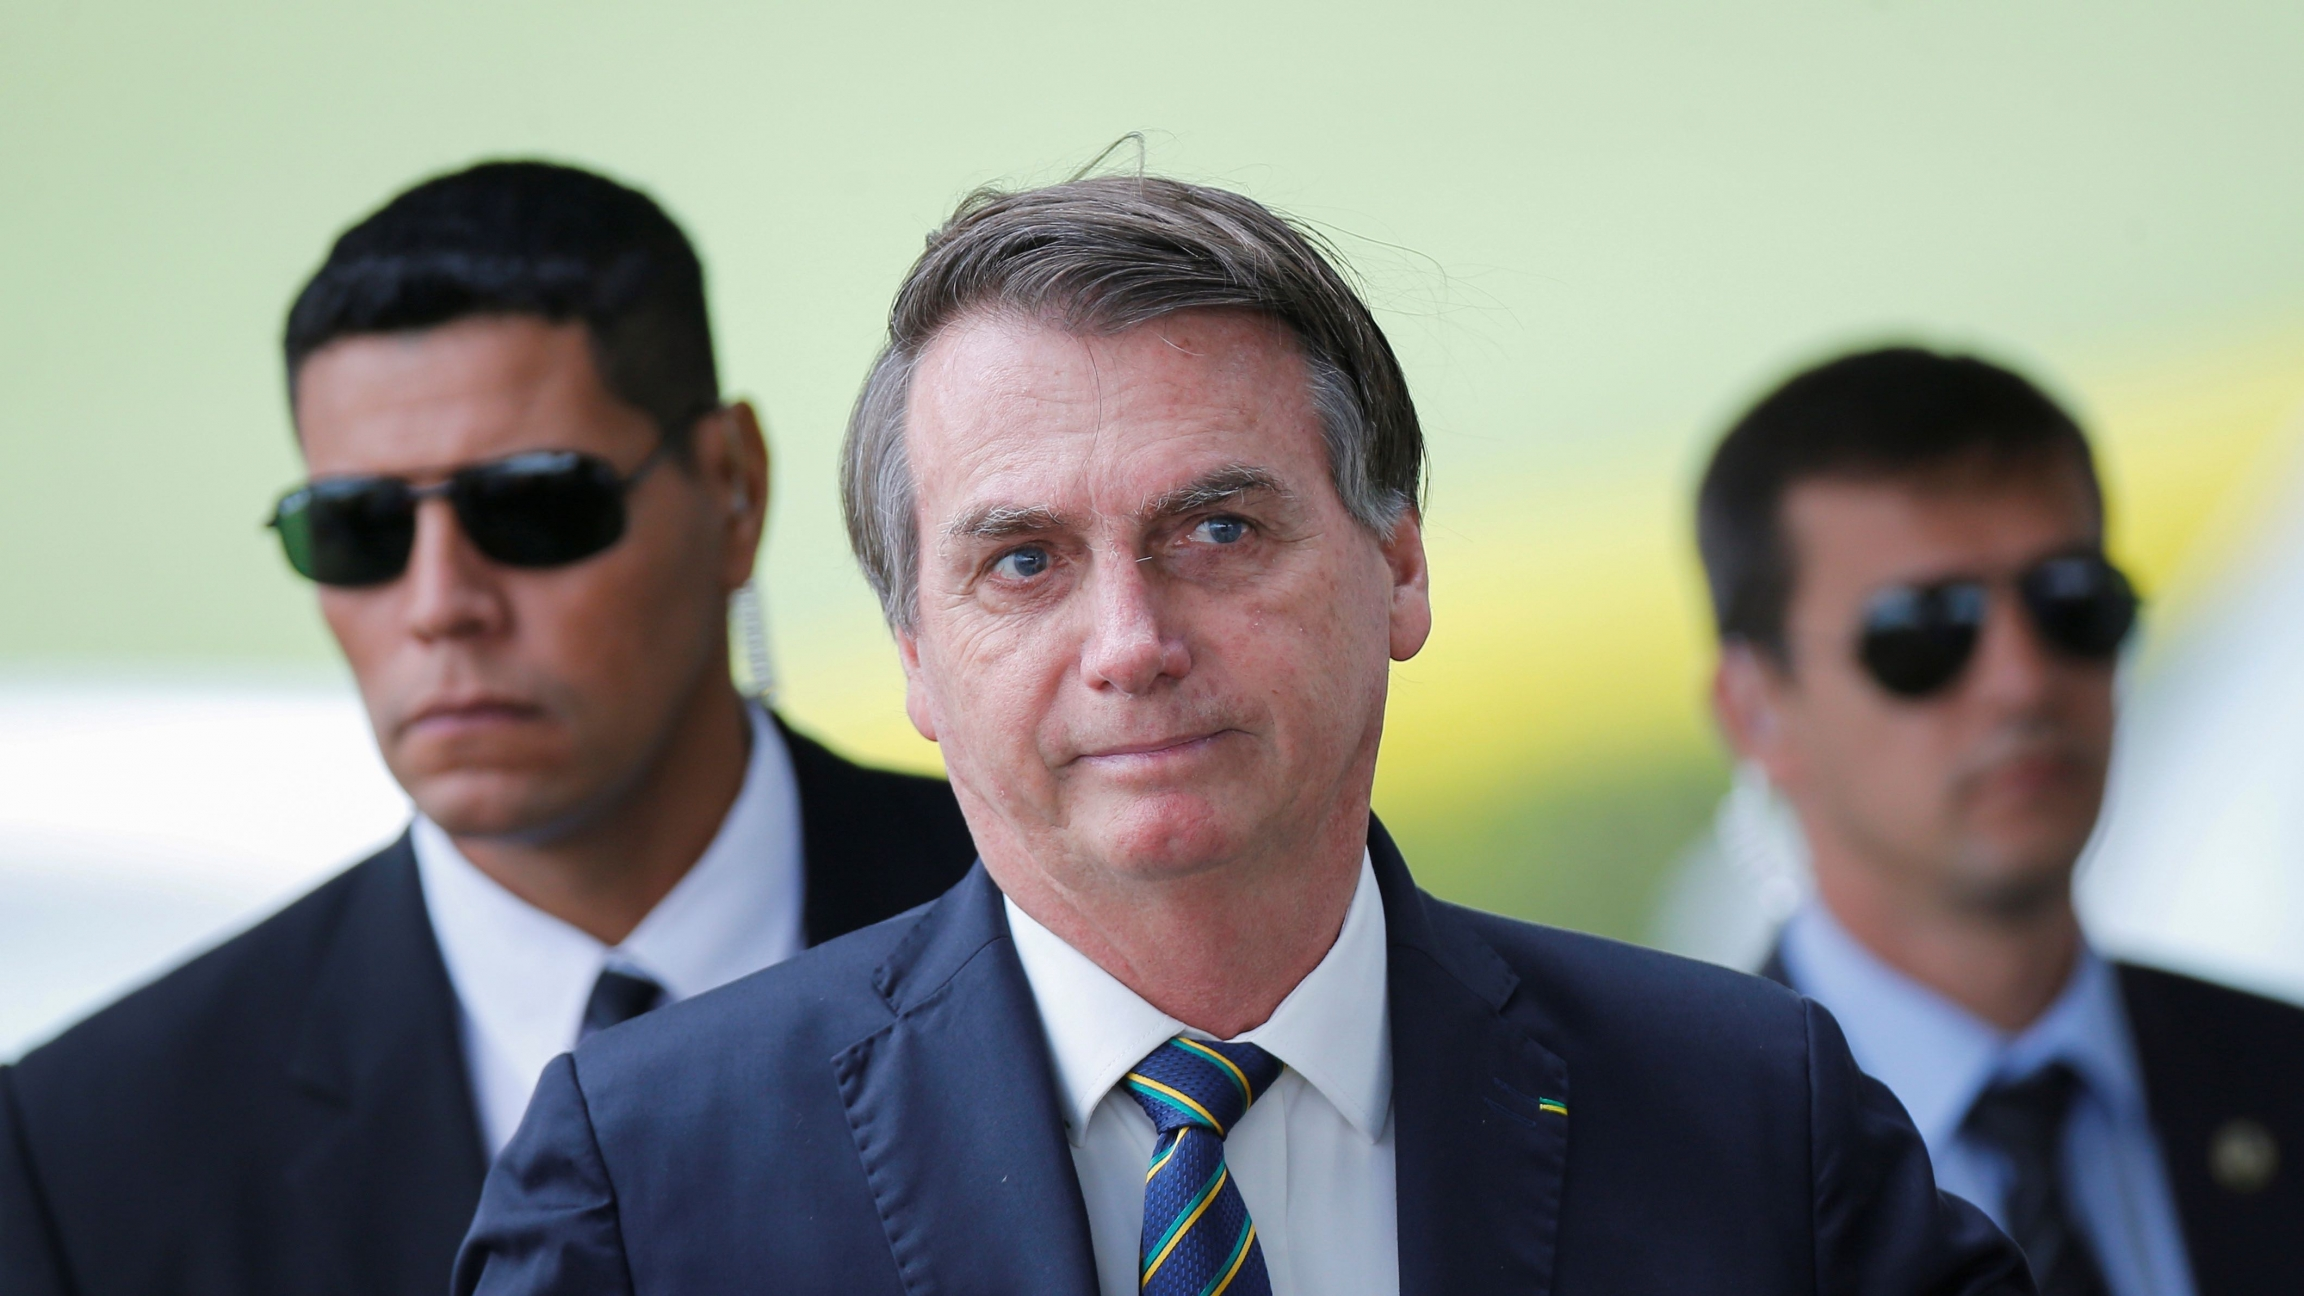 Brazil's President Jair Bolsonaro leaves Alvorada Palace, amid the coronavirus disease (COVID-19) outbreak, in Brasilia,Brazil, April 14, 2020.